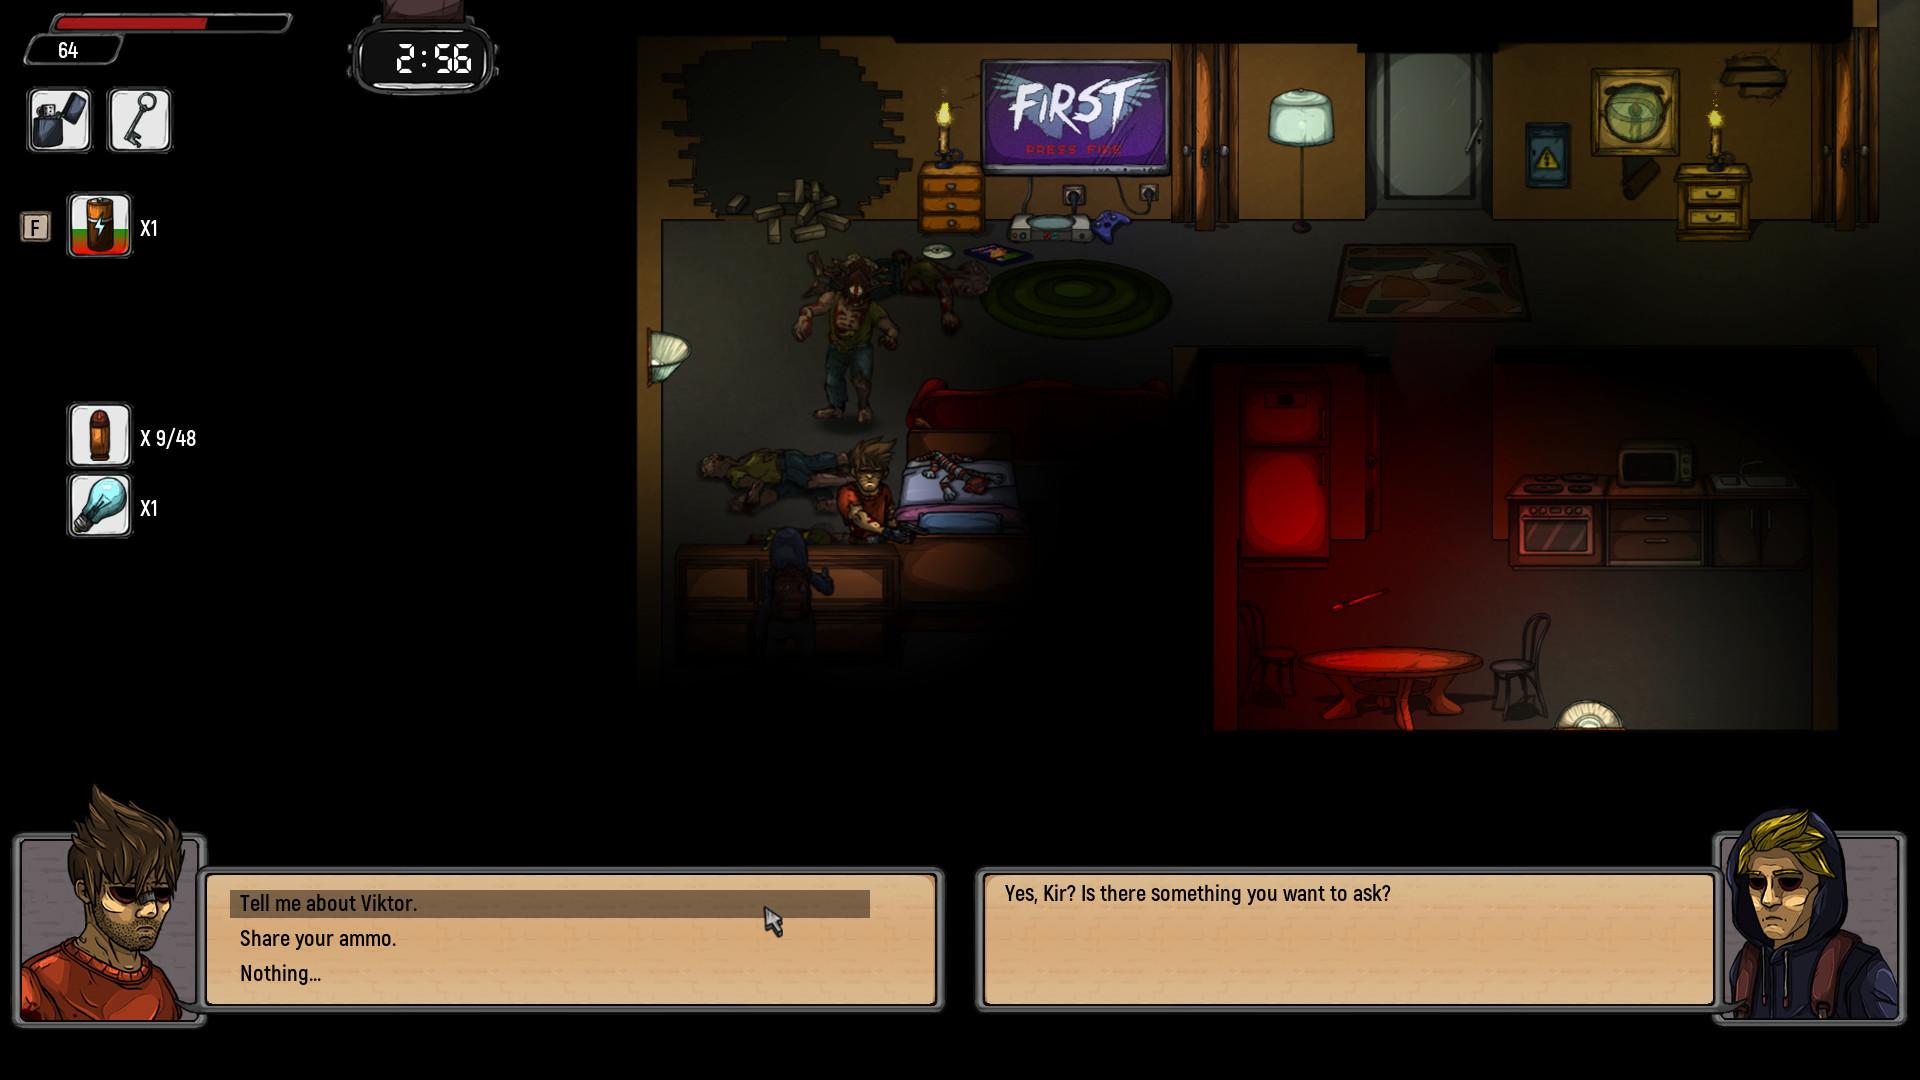 Knock Harder: Useless screenshot